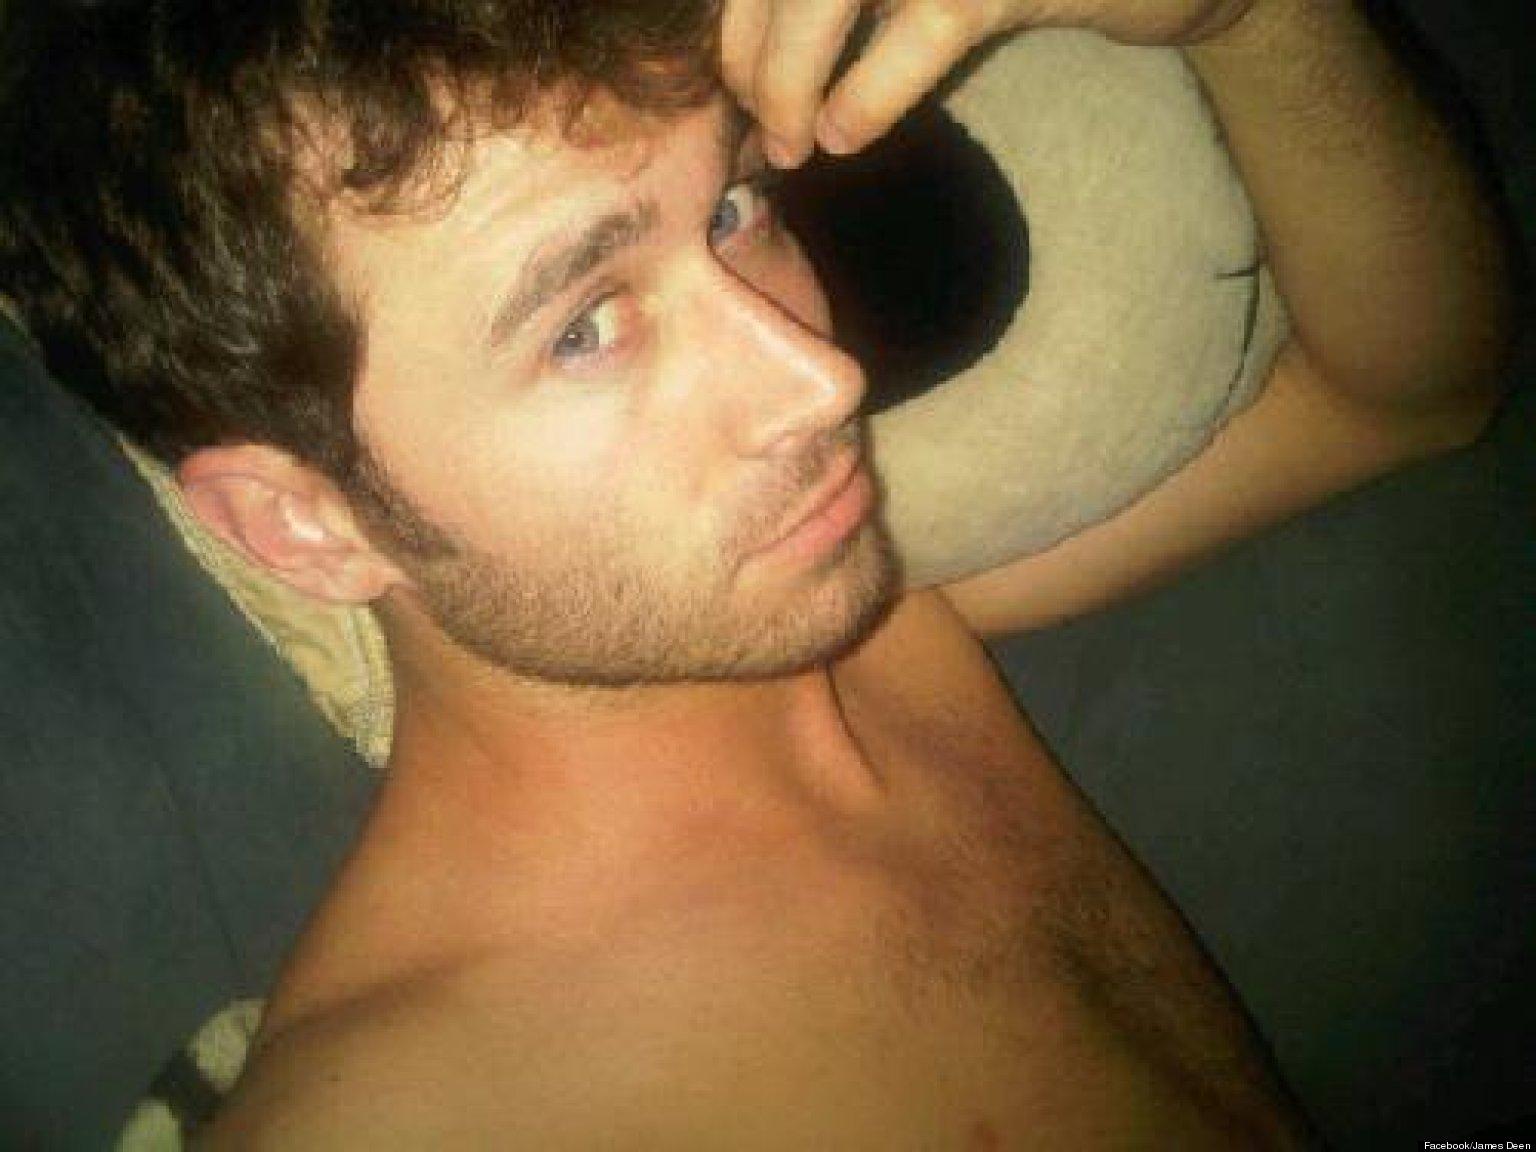 Джеймс дин порноактер размер членам